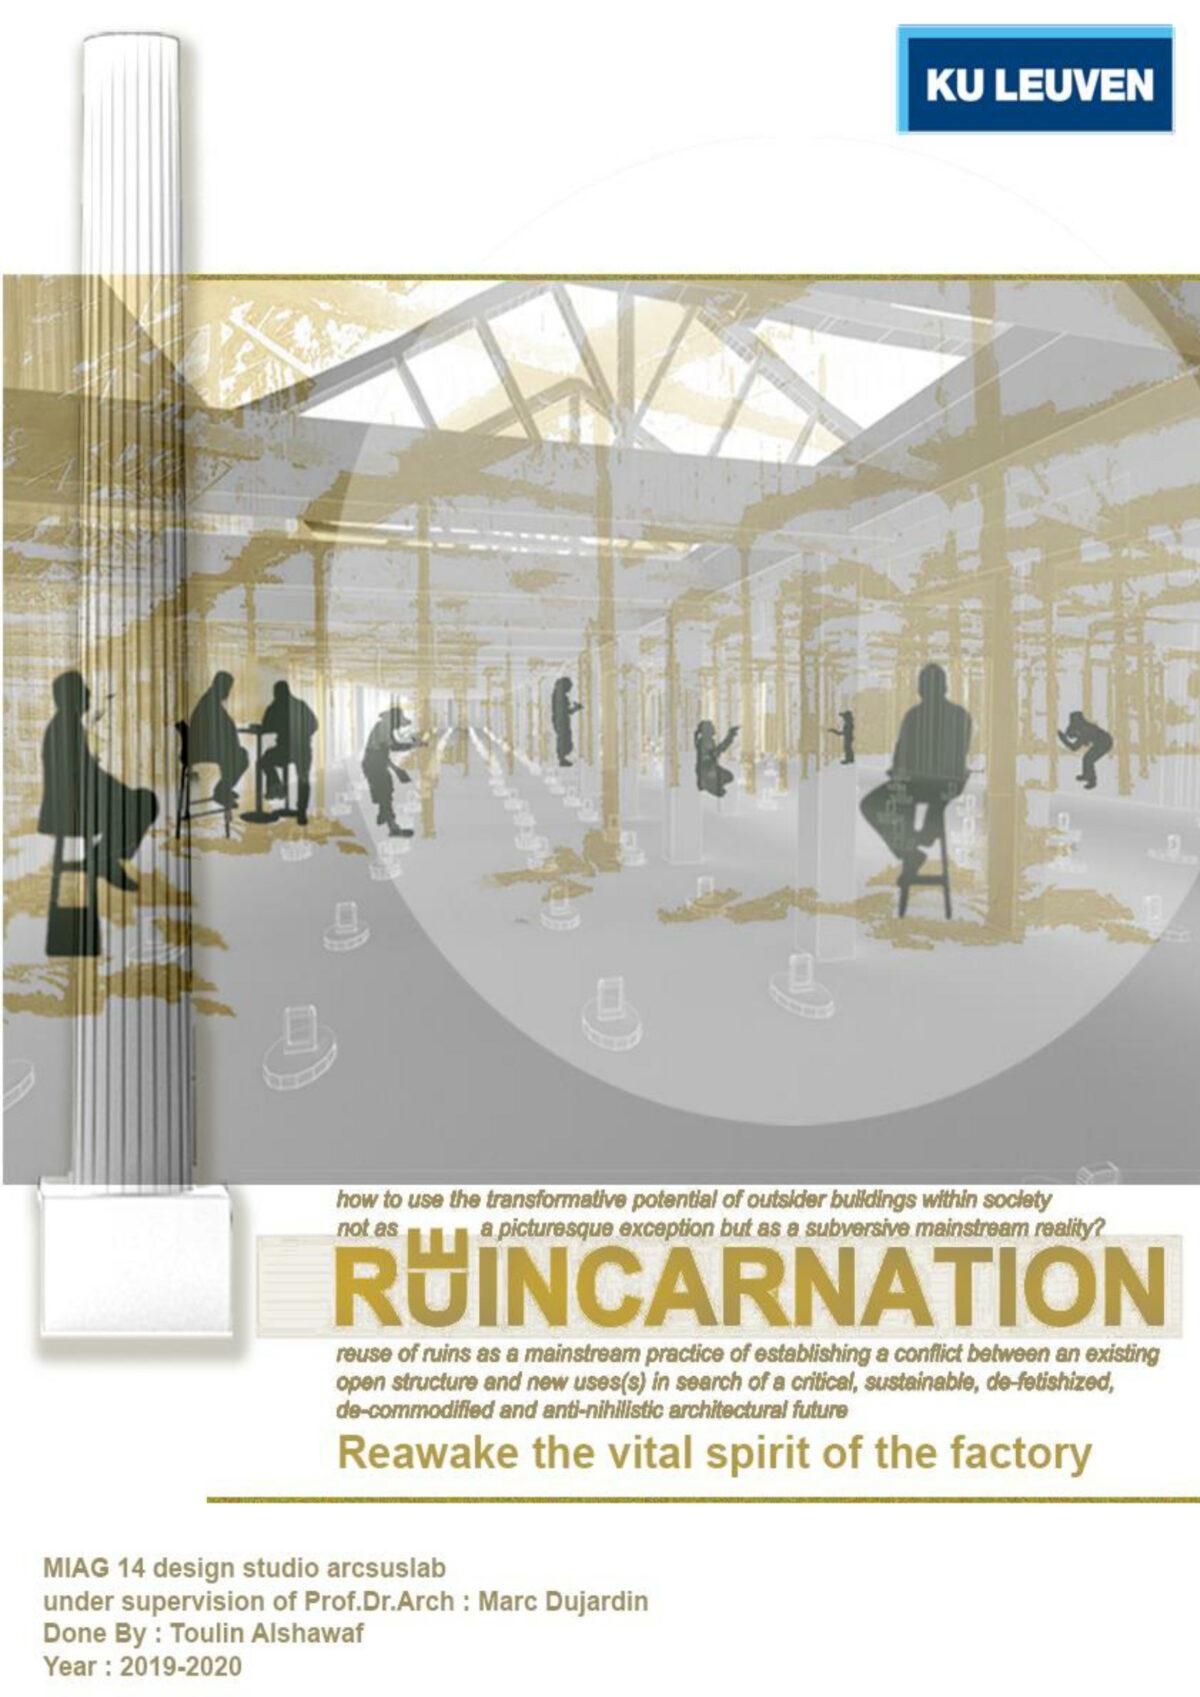 ruincarnation-the-reawake-of-tf-leporello-maig14-2019-2020-1